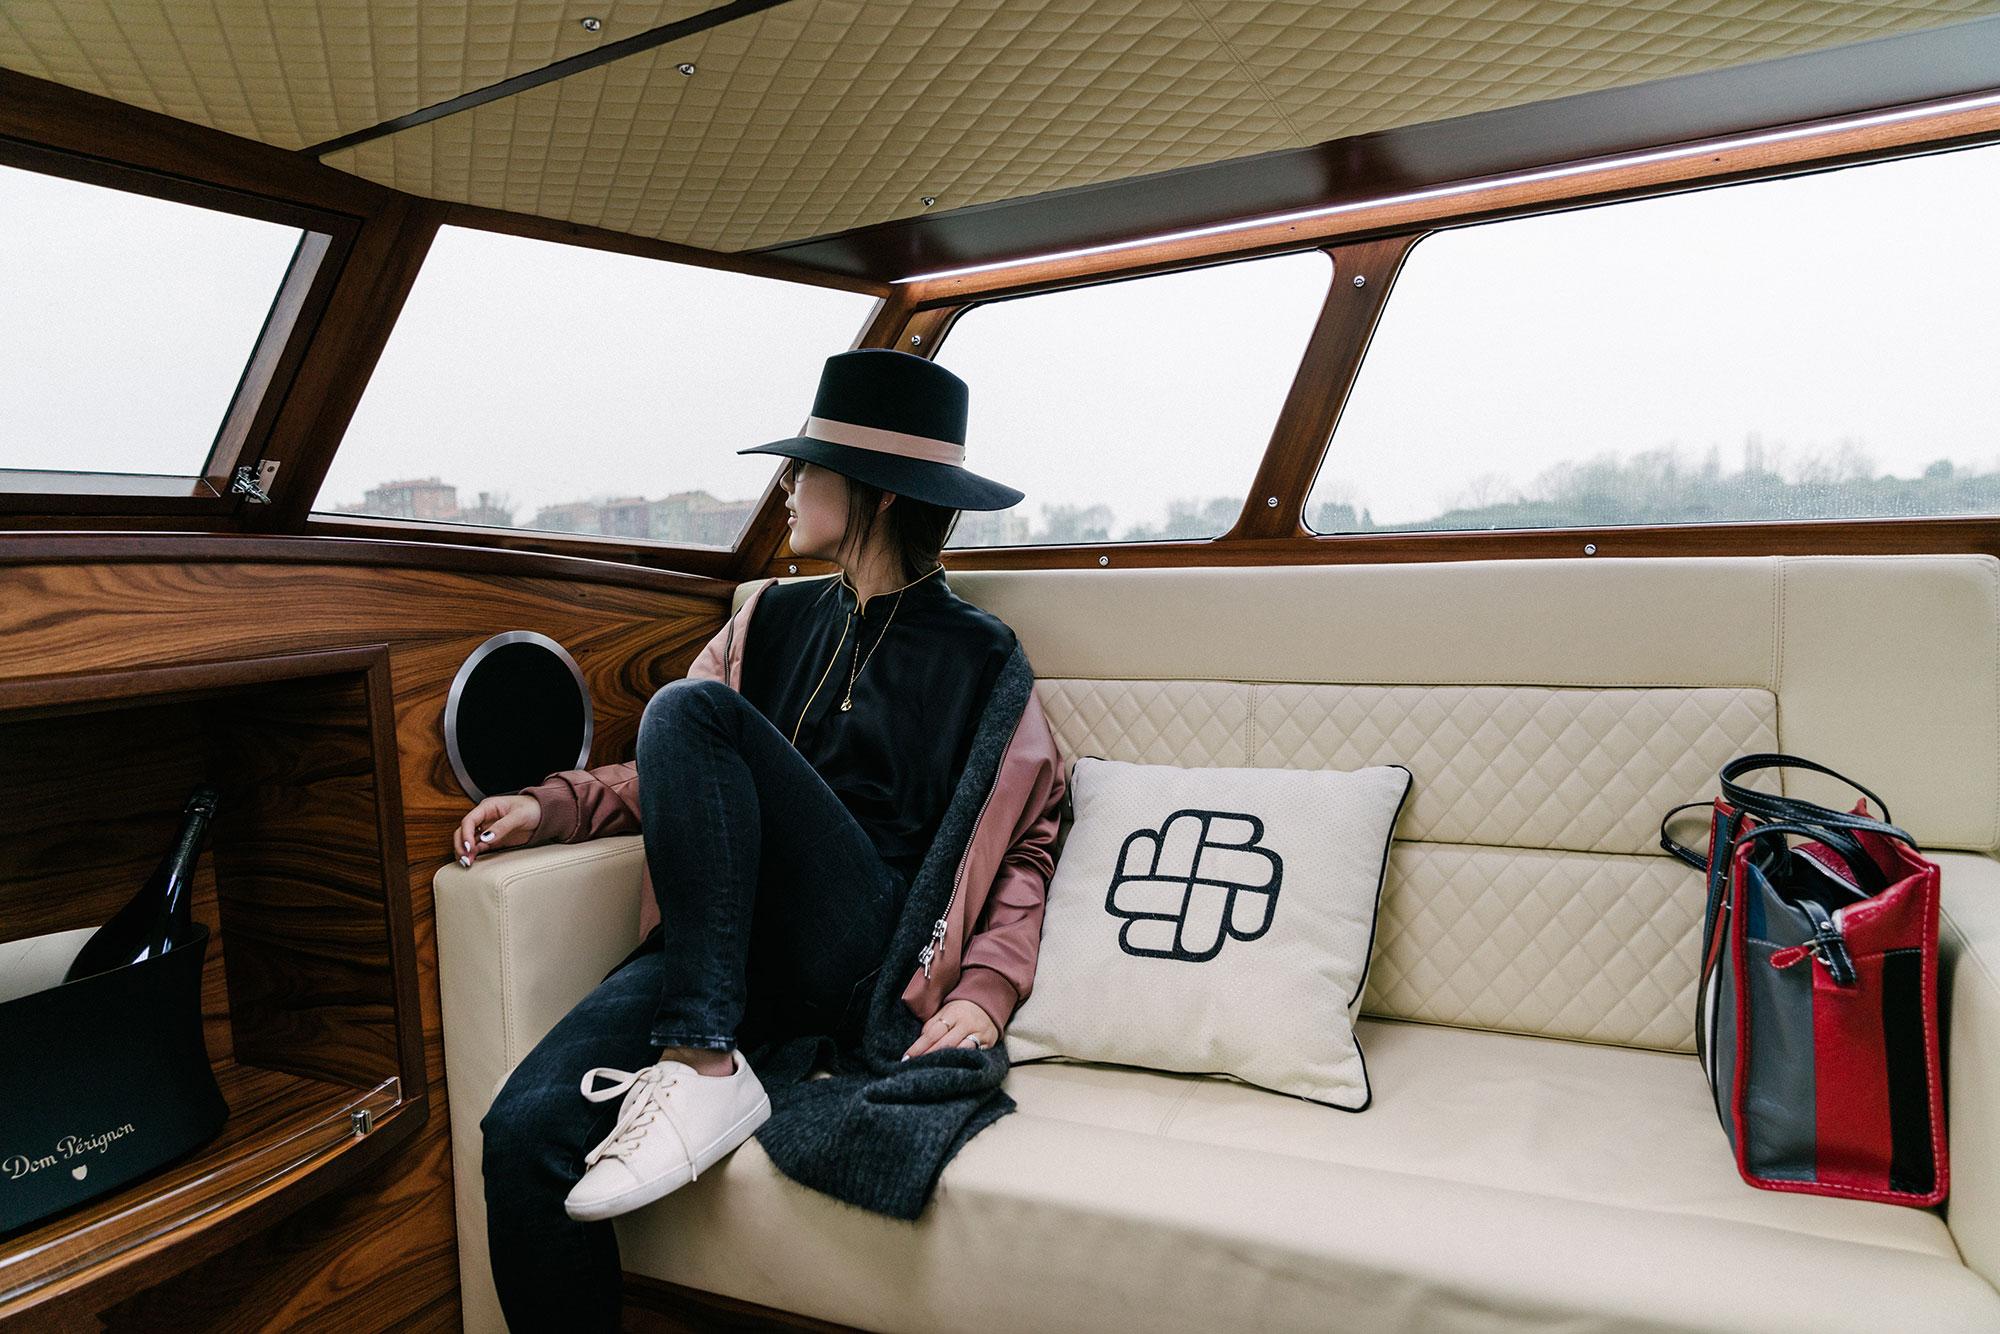 Acne Studios Jacket and Cardigan,  Homeism Top ,  R13 Denim ,  Sézane Sneakers ,  Cartier Necklace ,  Janessa Leone Hat , Balenciaga Bag